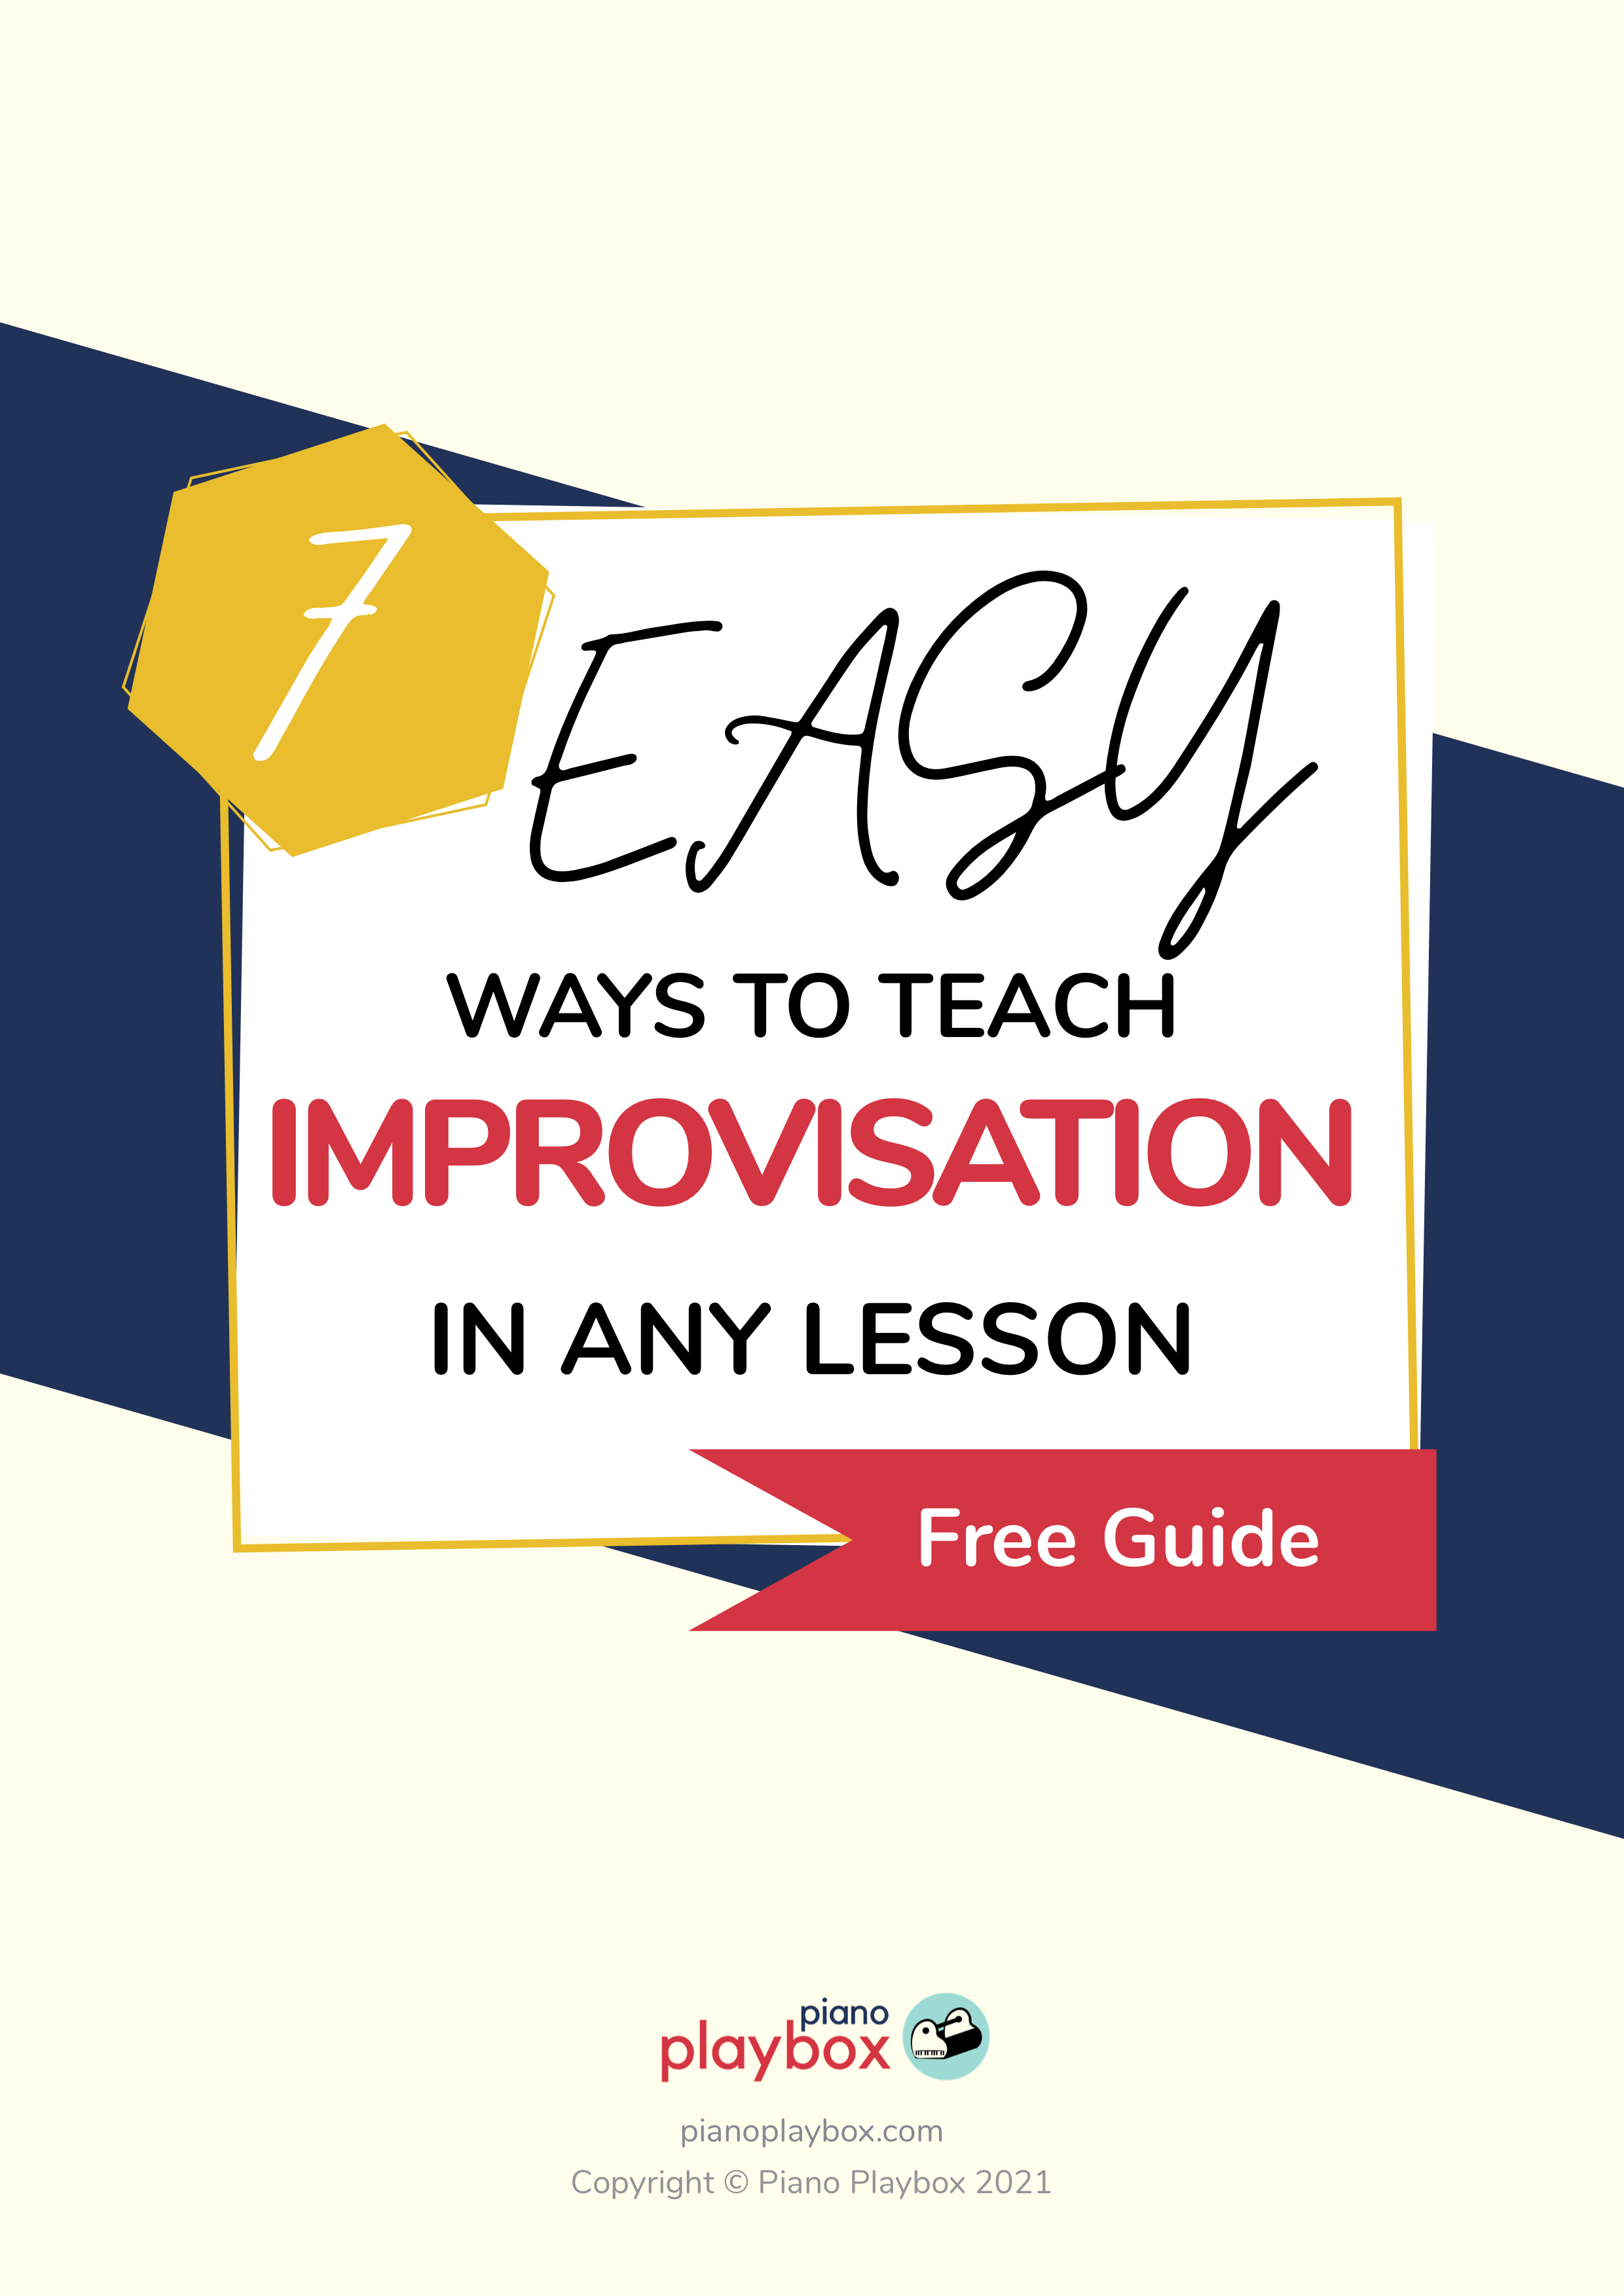 How to teach improvisation to kids